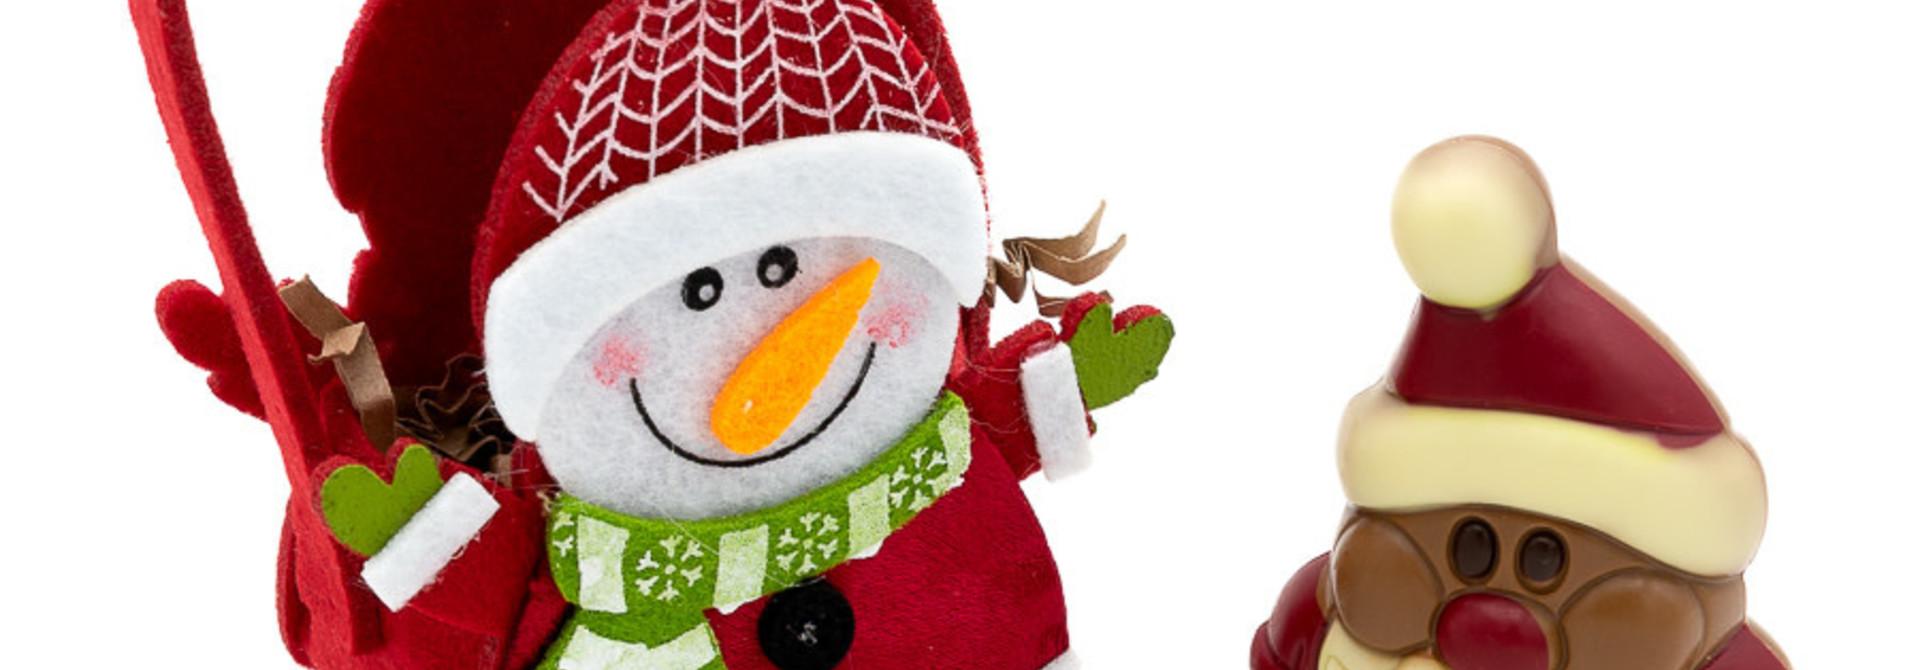 Hippy Santa Claus in bag